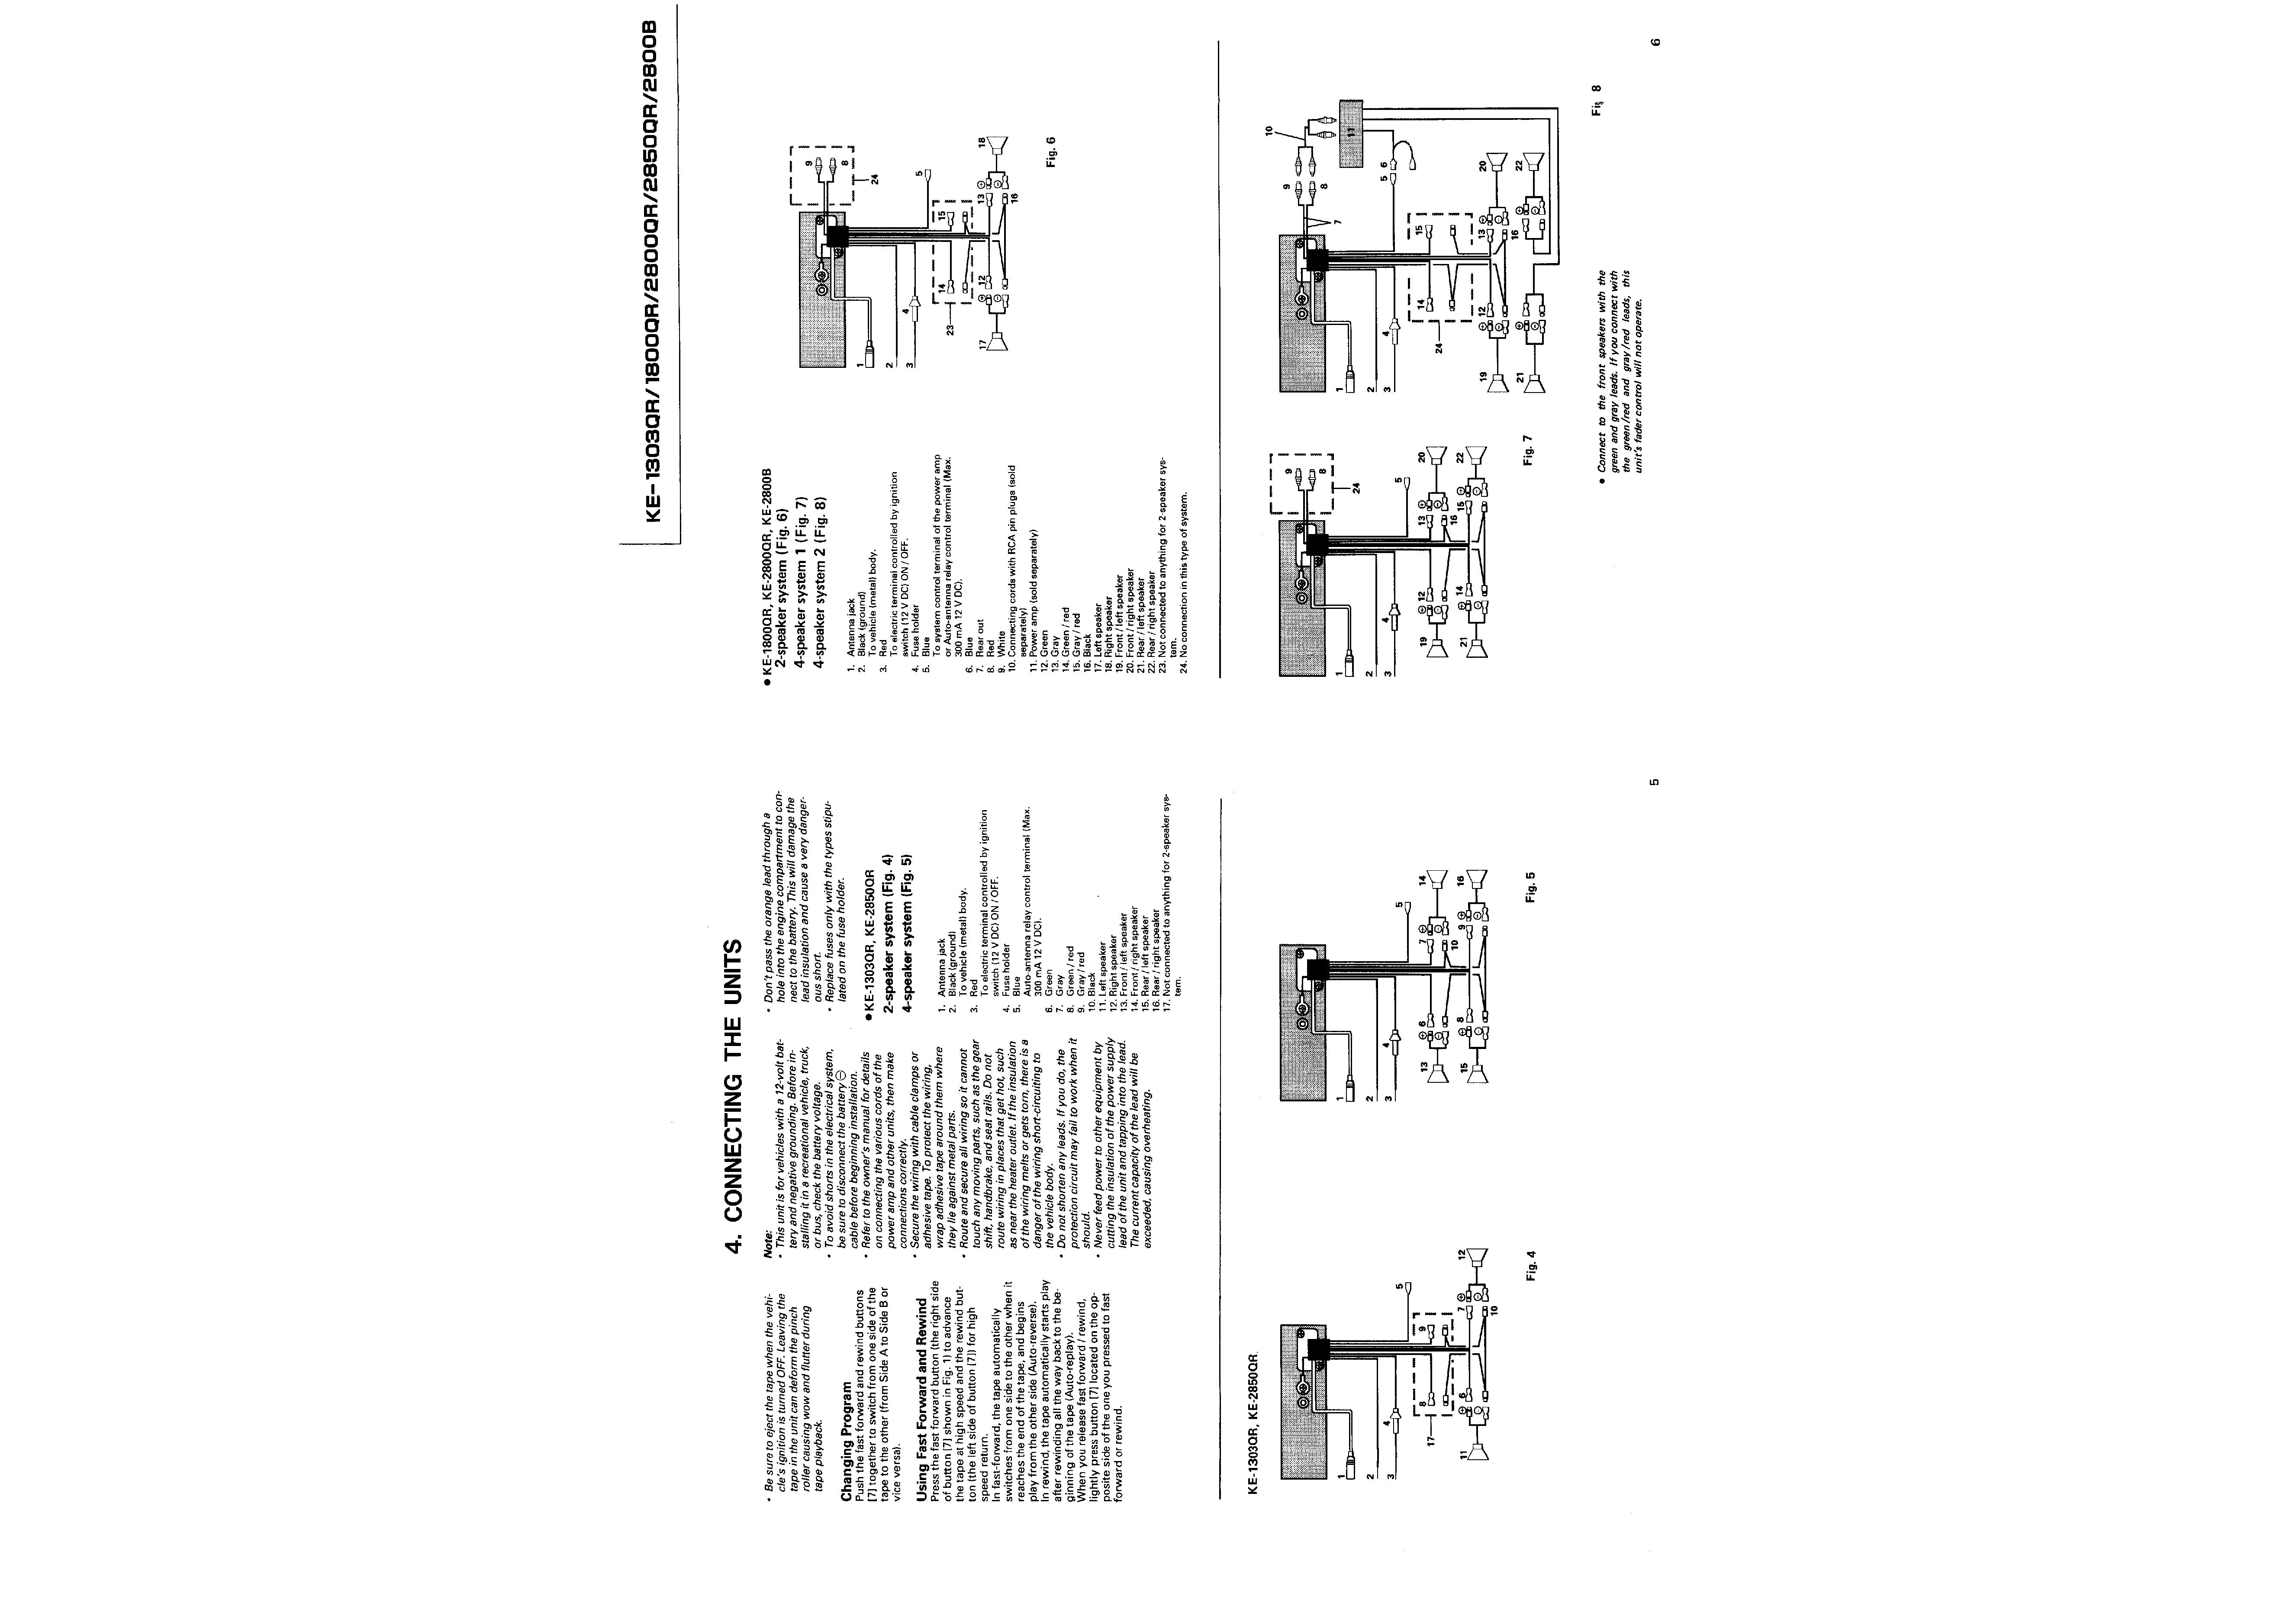 service manual for pioneer ke-2850qr